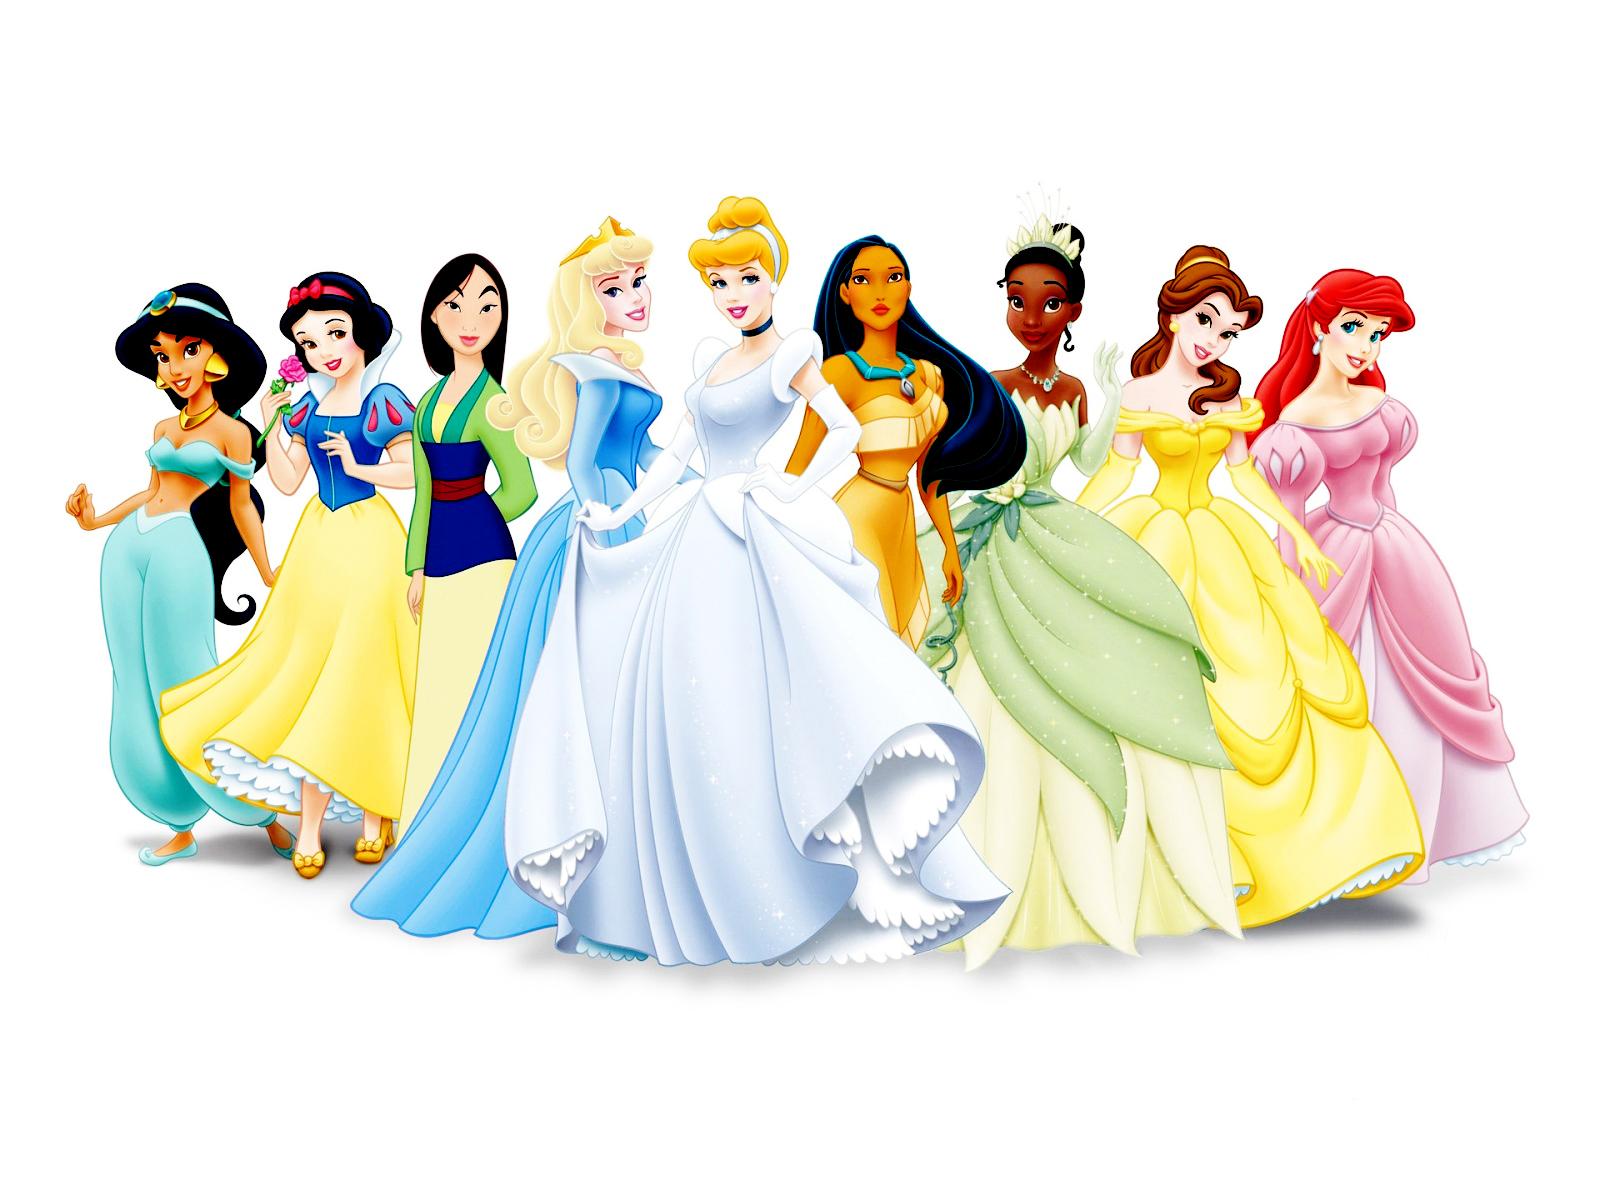 All Beauty Queen Cartoon Wallpapers